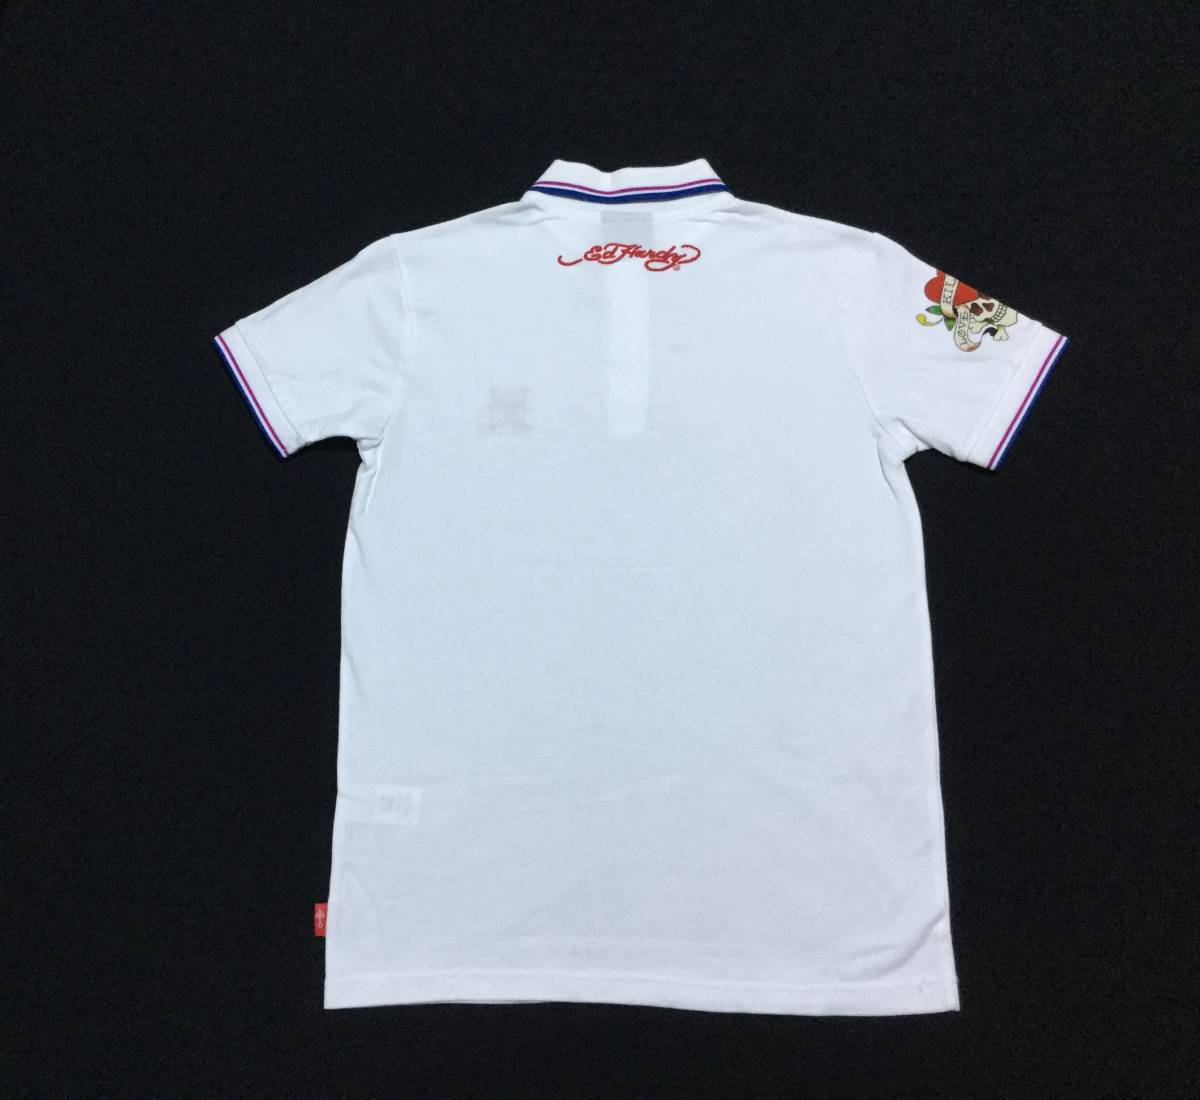 ED HARDY エドハーディー // 刺繍 プリント 半袖 ポロシャツ (白) サイズ M_画像2